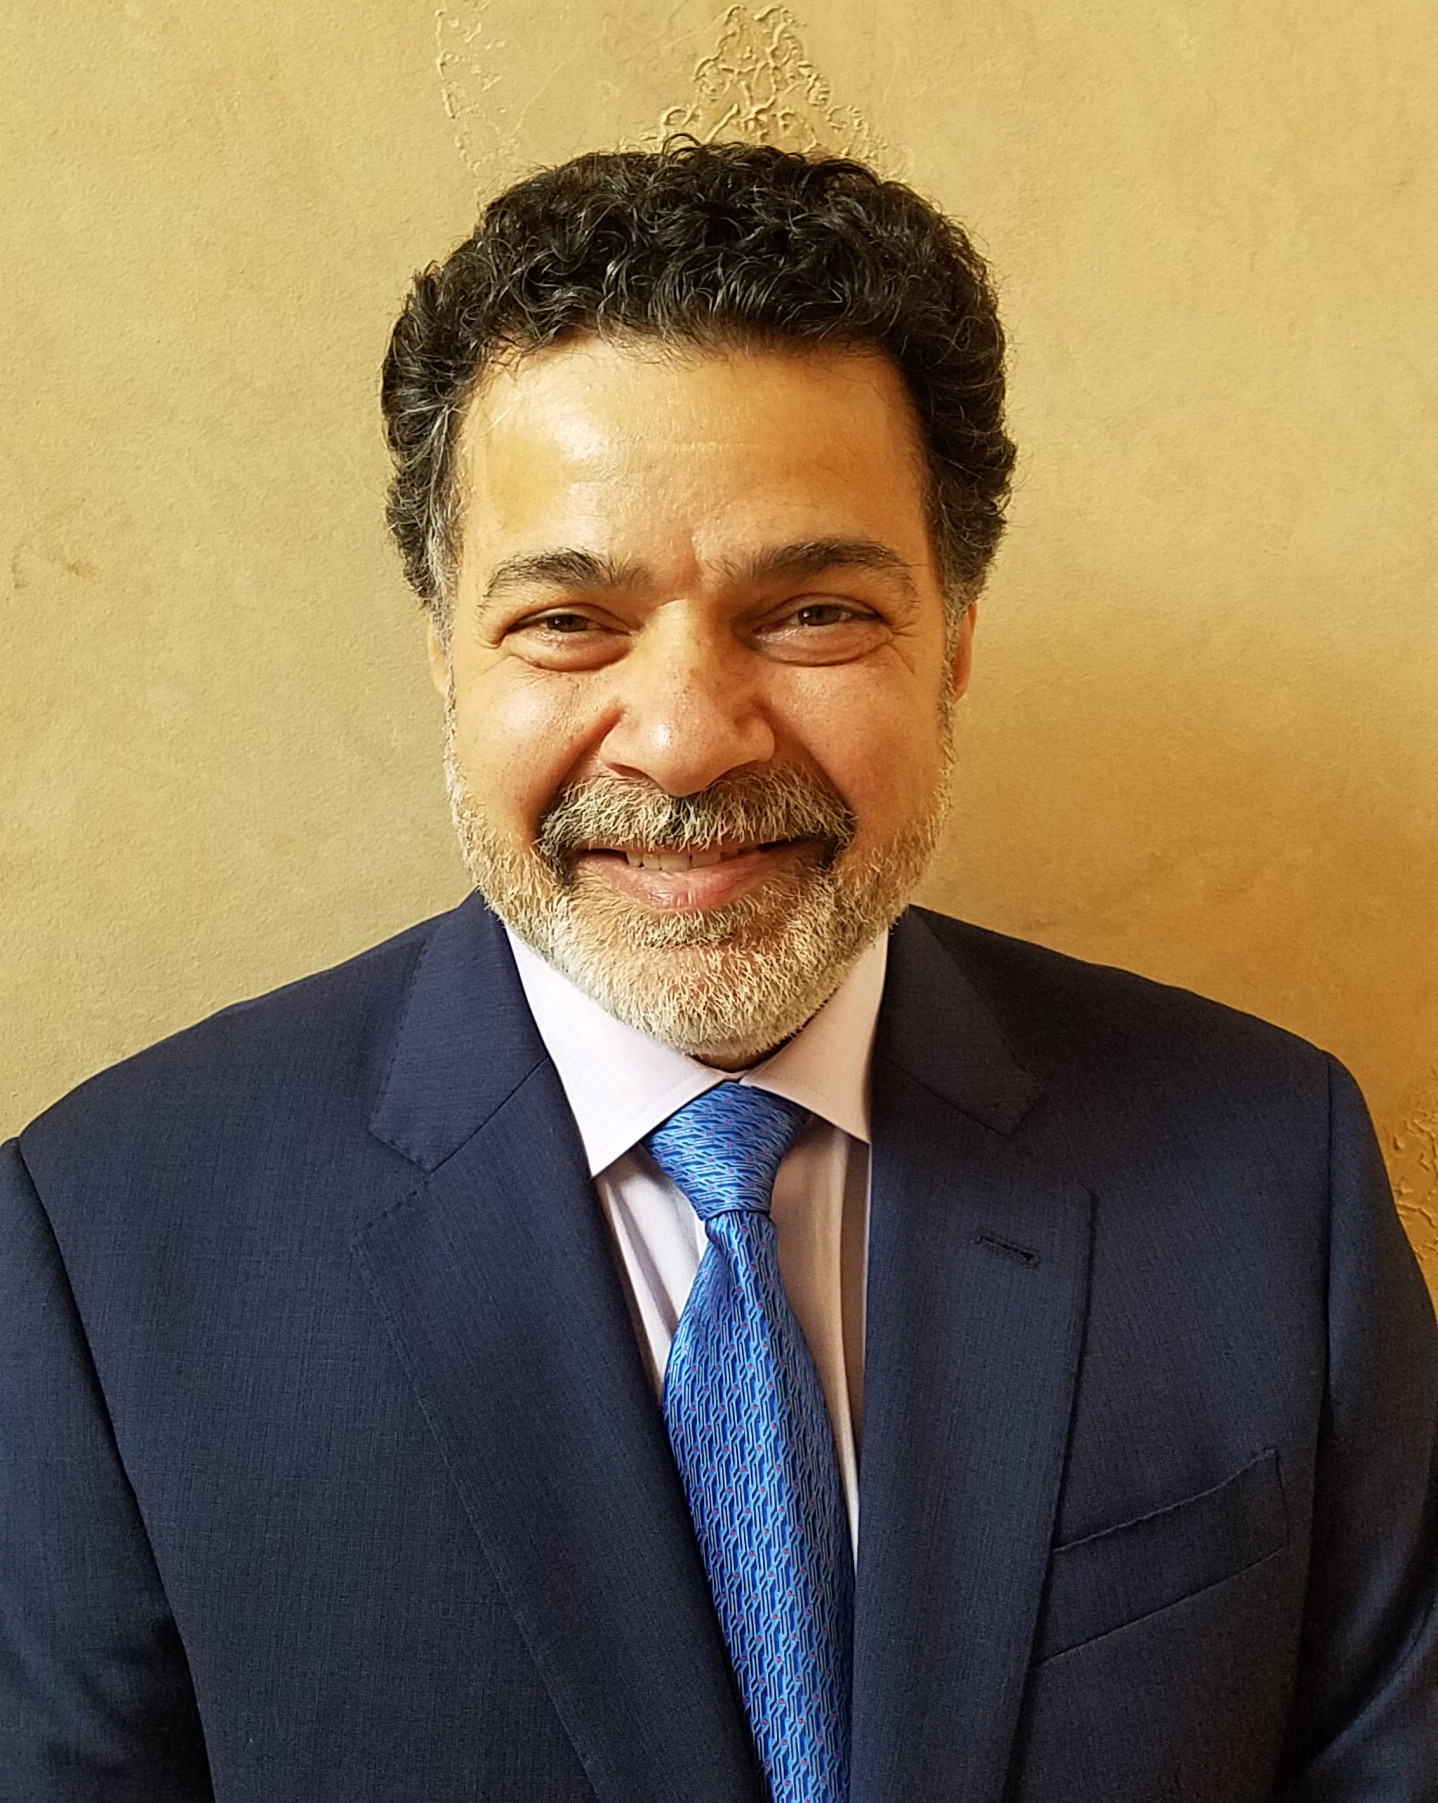 John S. Brinzo, National Advisory Board Member, College of Business Administration, Kent State University, Kent, Ohio